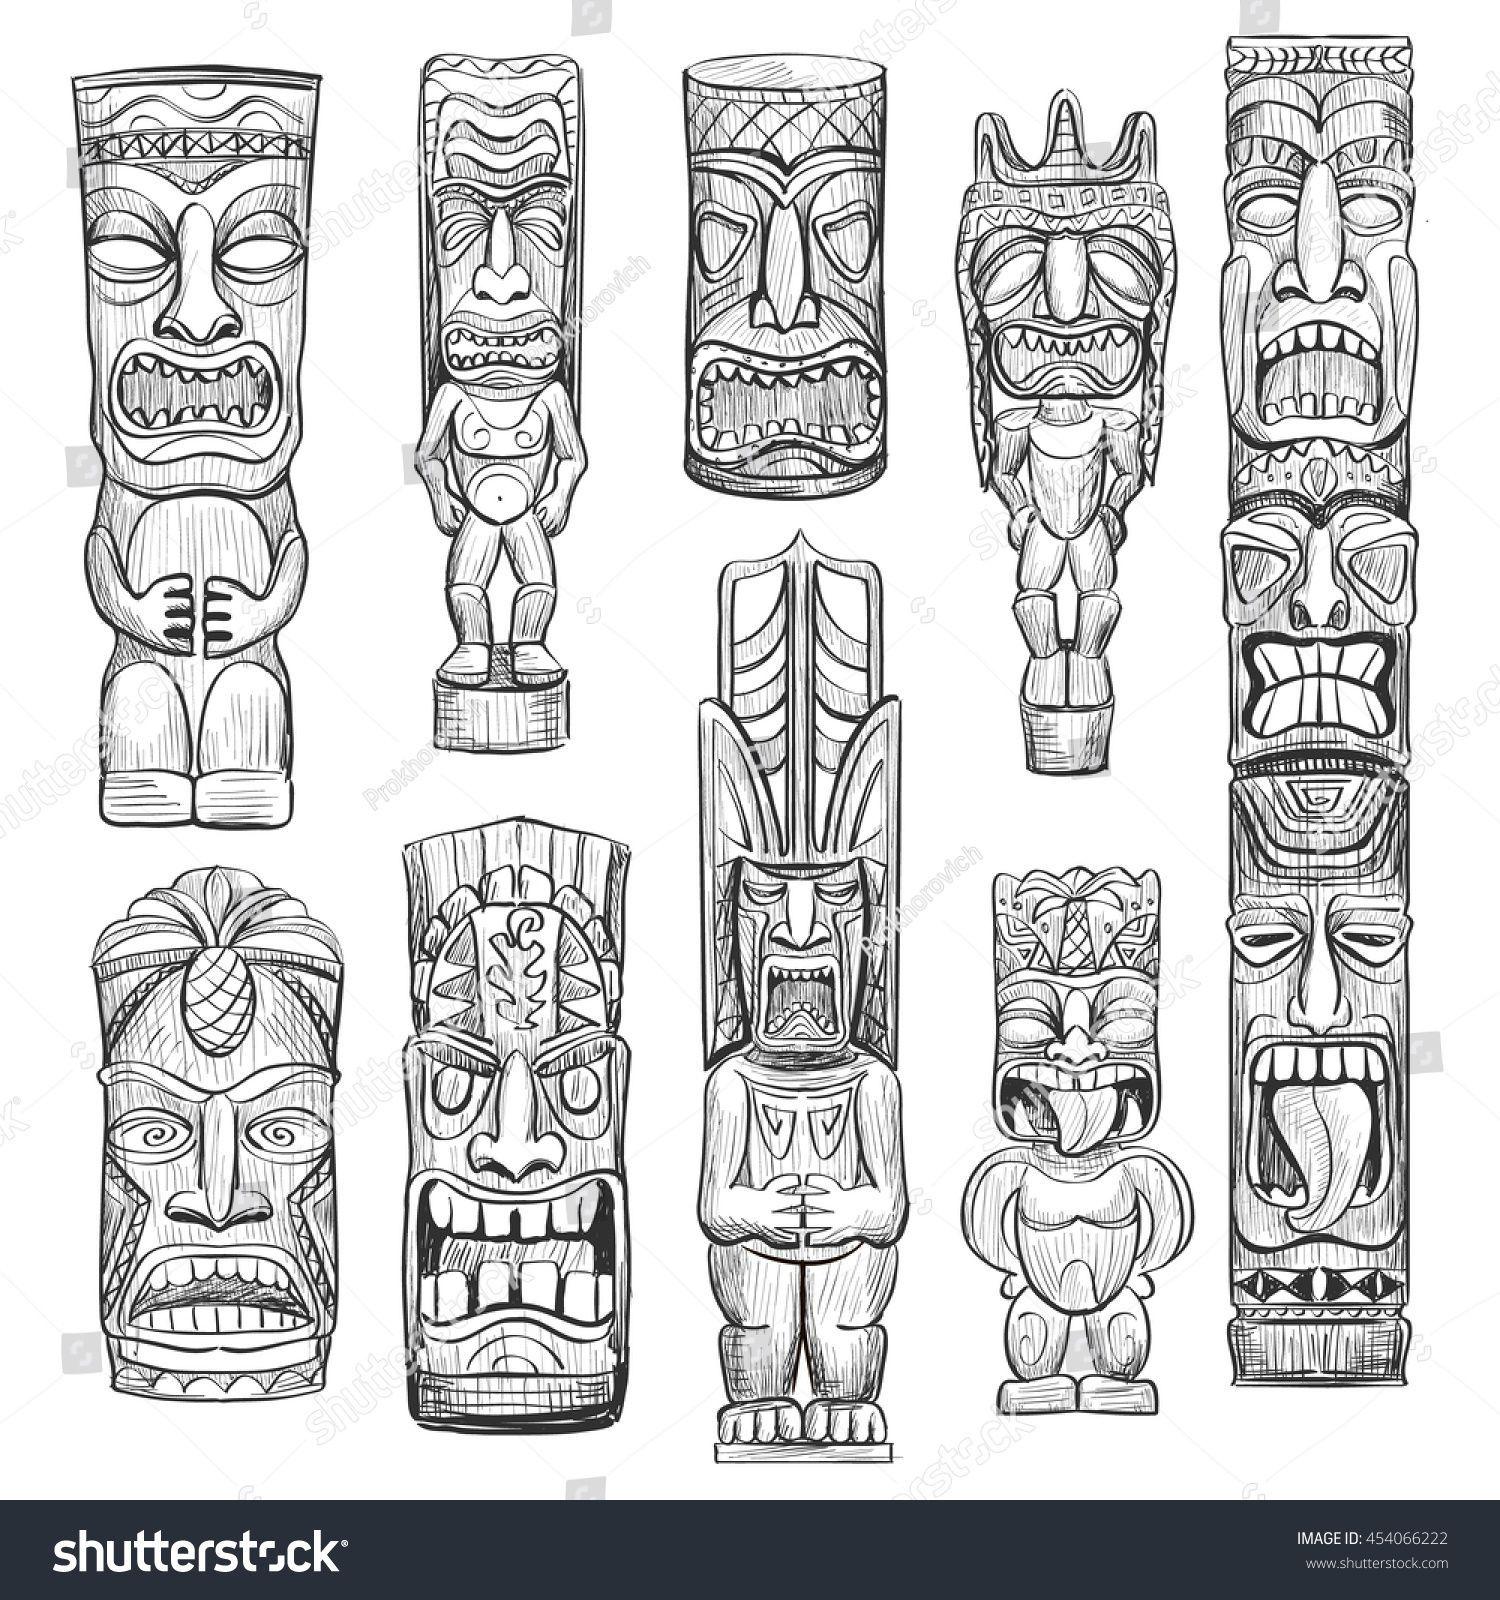 Vector collection of sketches hawaiian tiki idols vector collection of sketches hawaiian tiki idols hawaiiantattoossymbols biocorpaavc Image collections